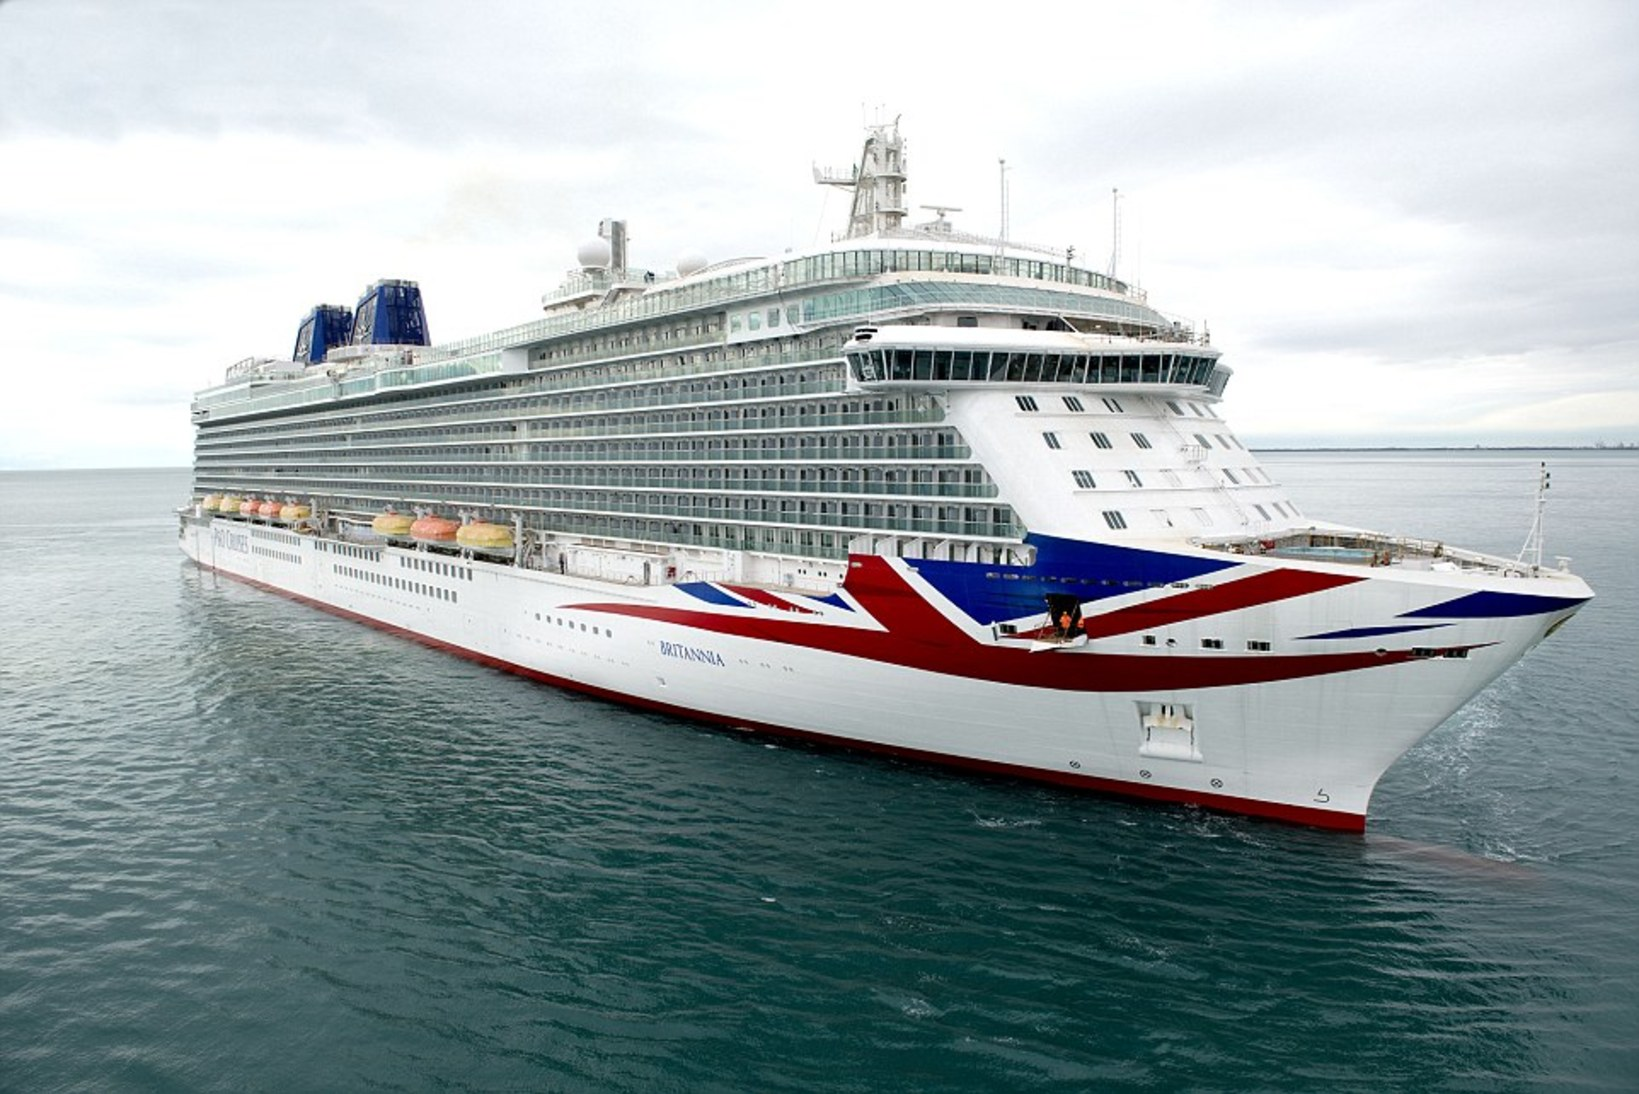 Southampton Cruise Shuttle Shared Ride